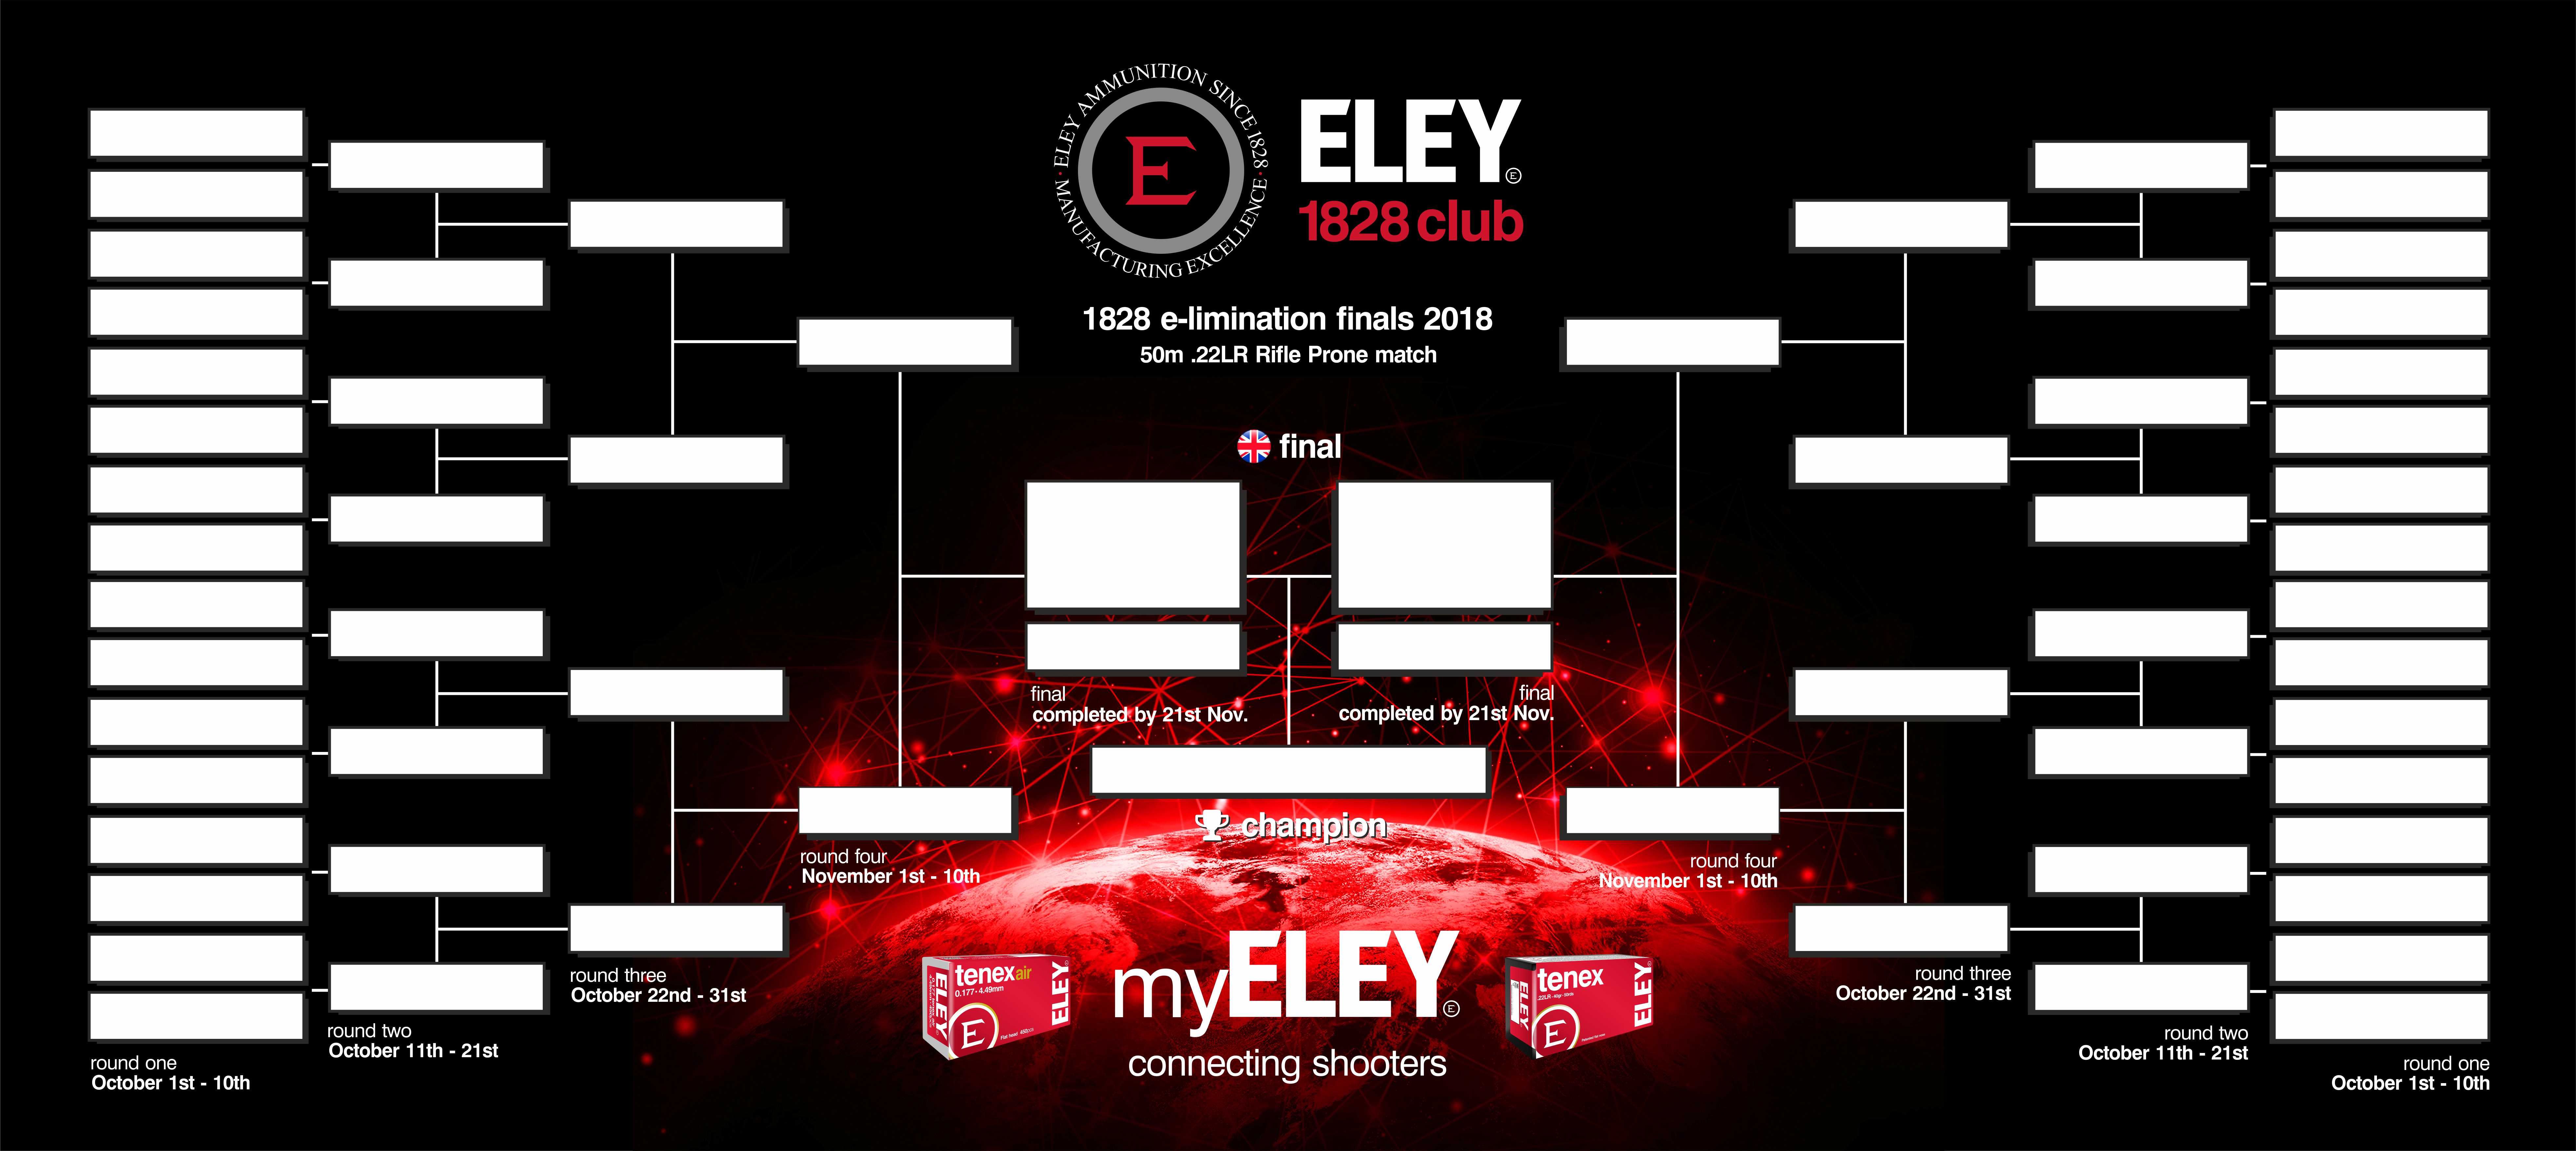 ELEY 1828 club e-limination match 2018